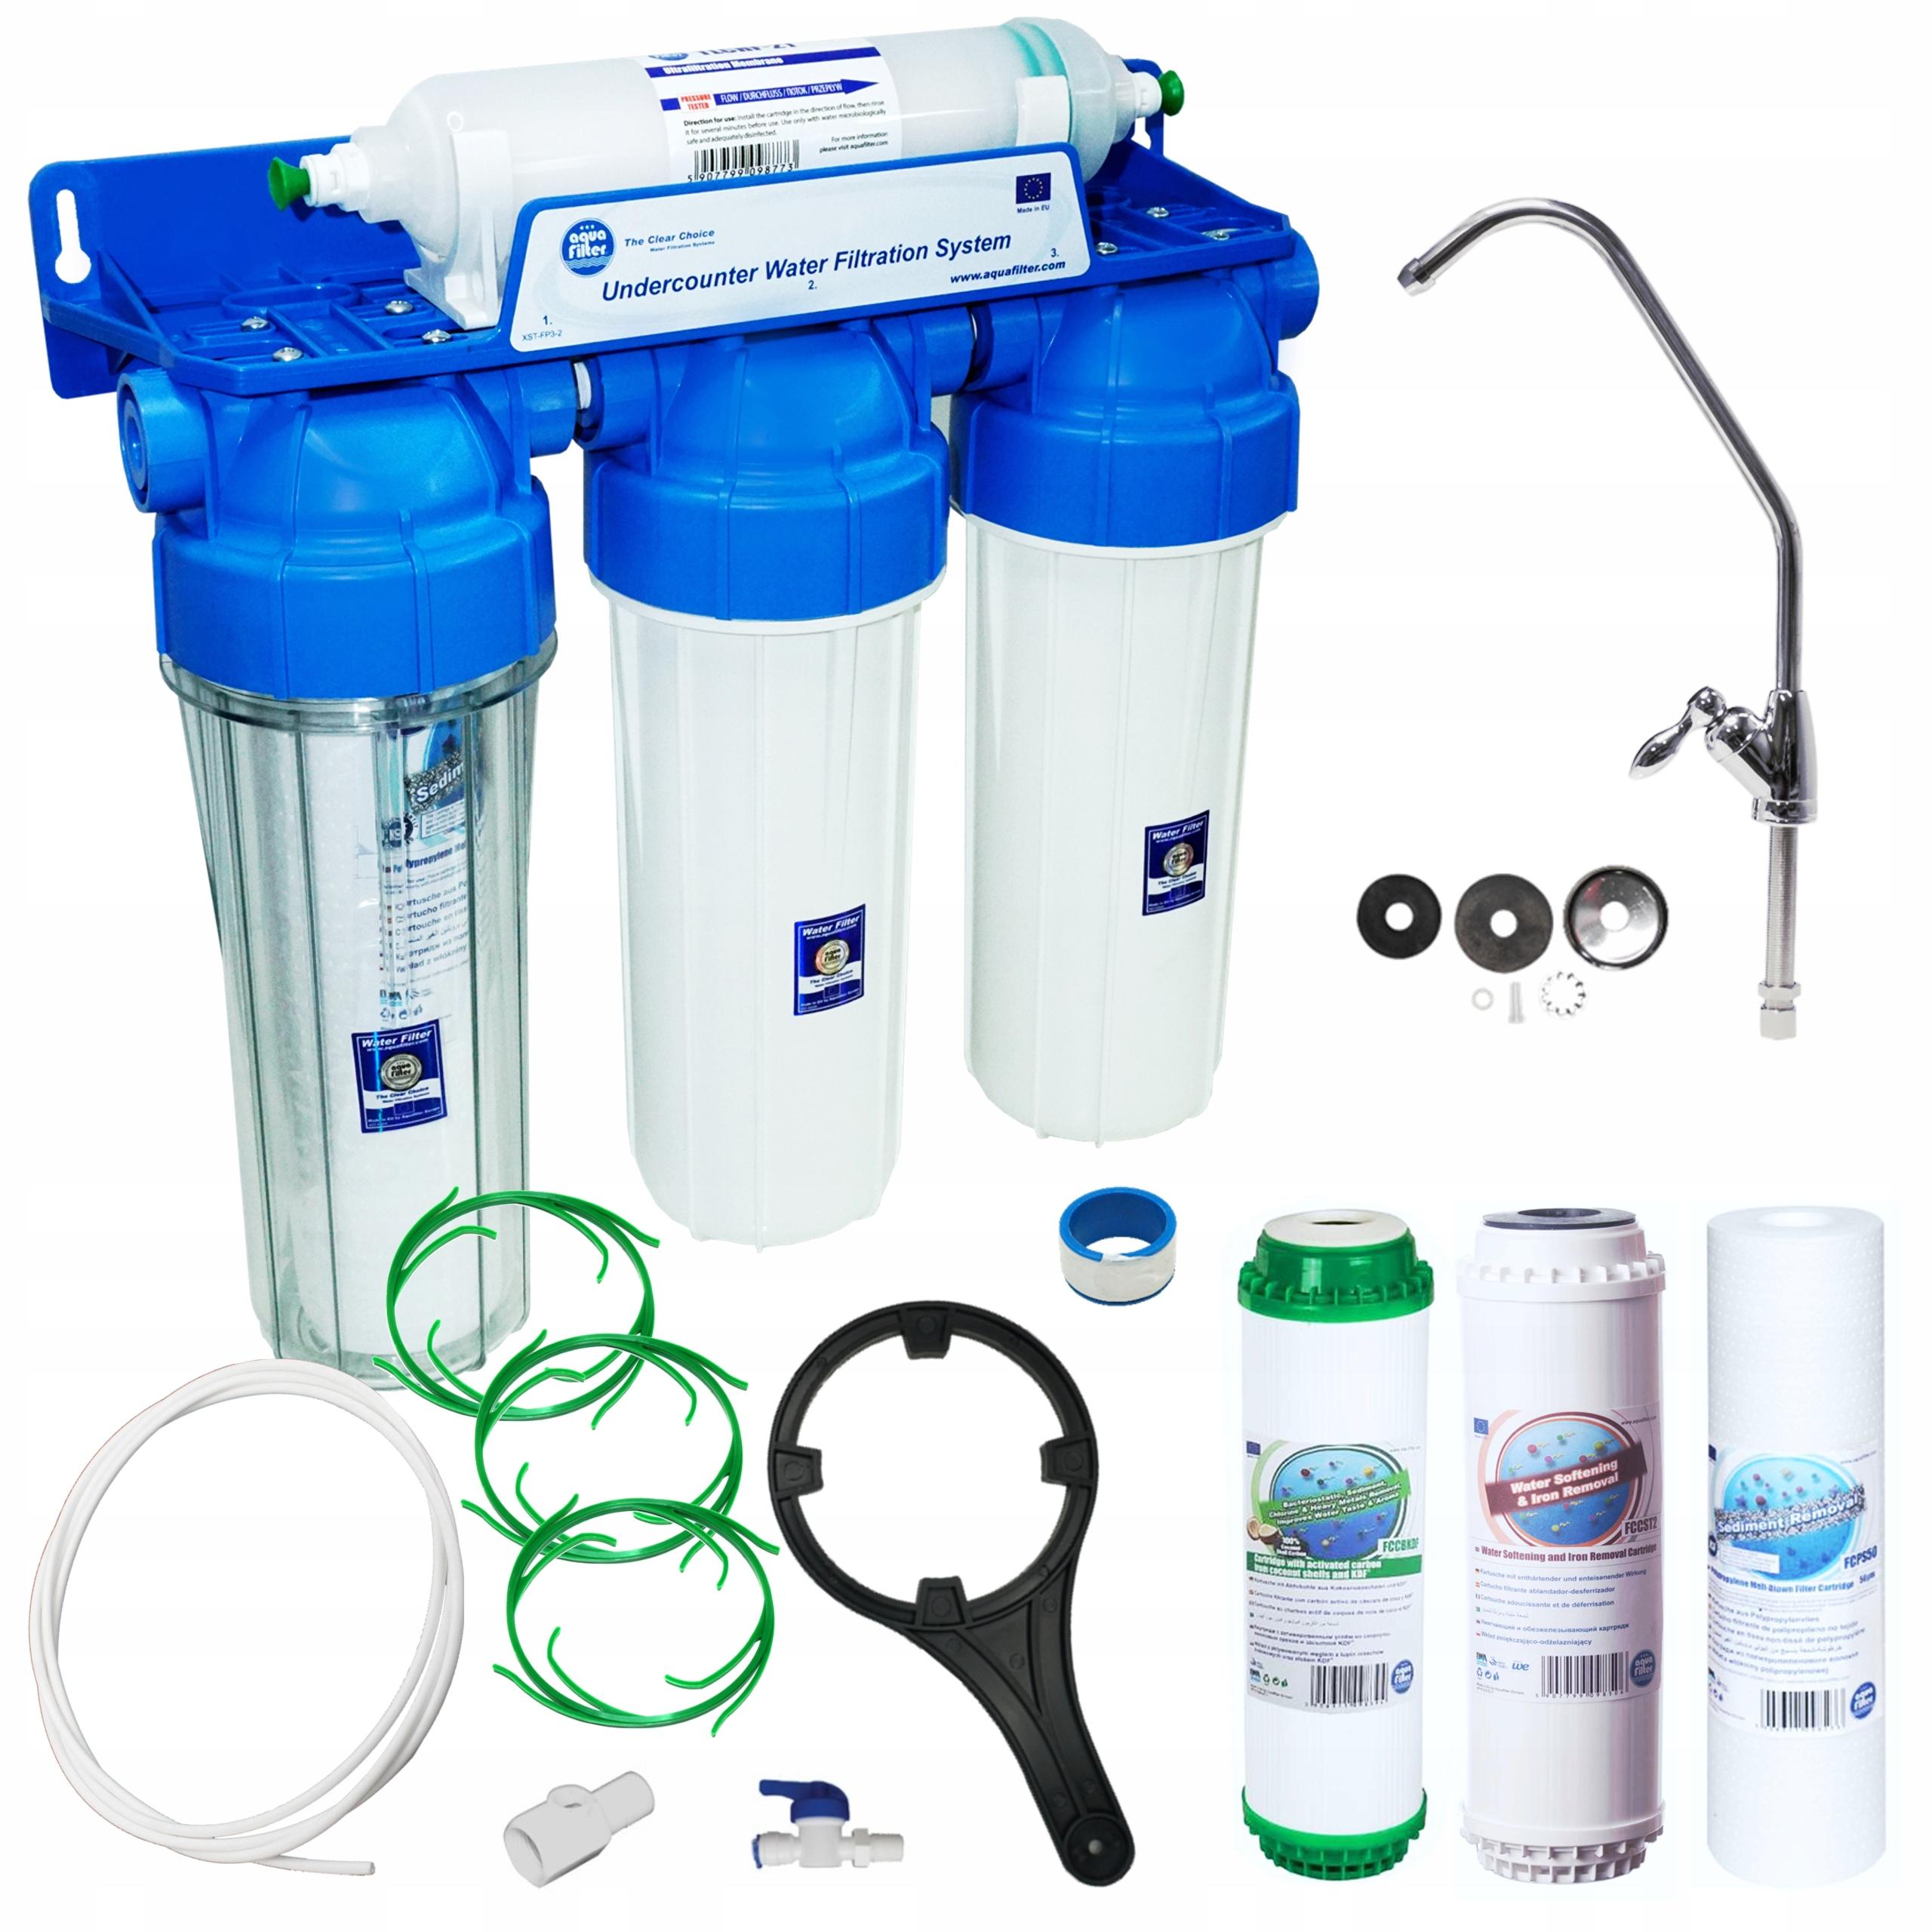 FP3-HJ-K1 Aquafilter Filter pre vodu pod KDF umývadlom